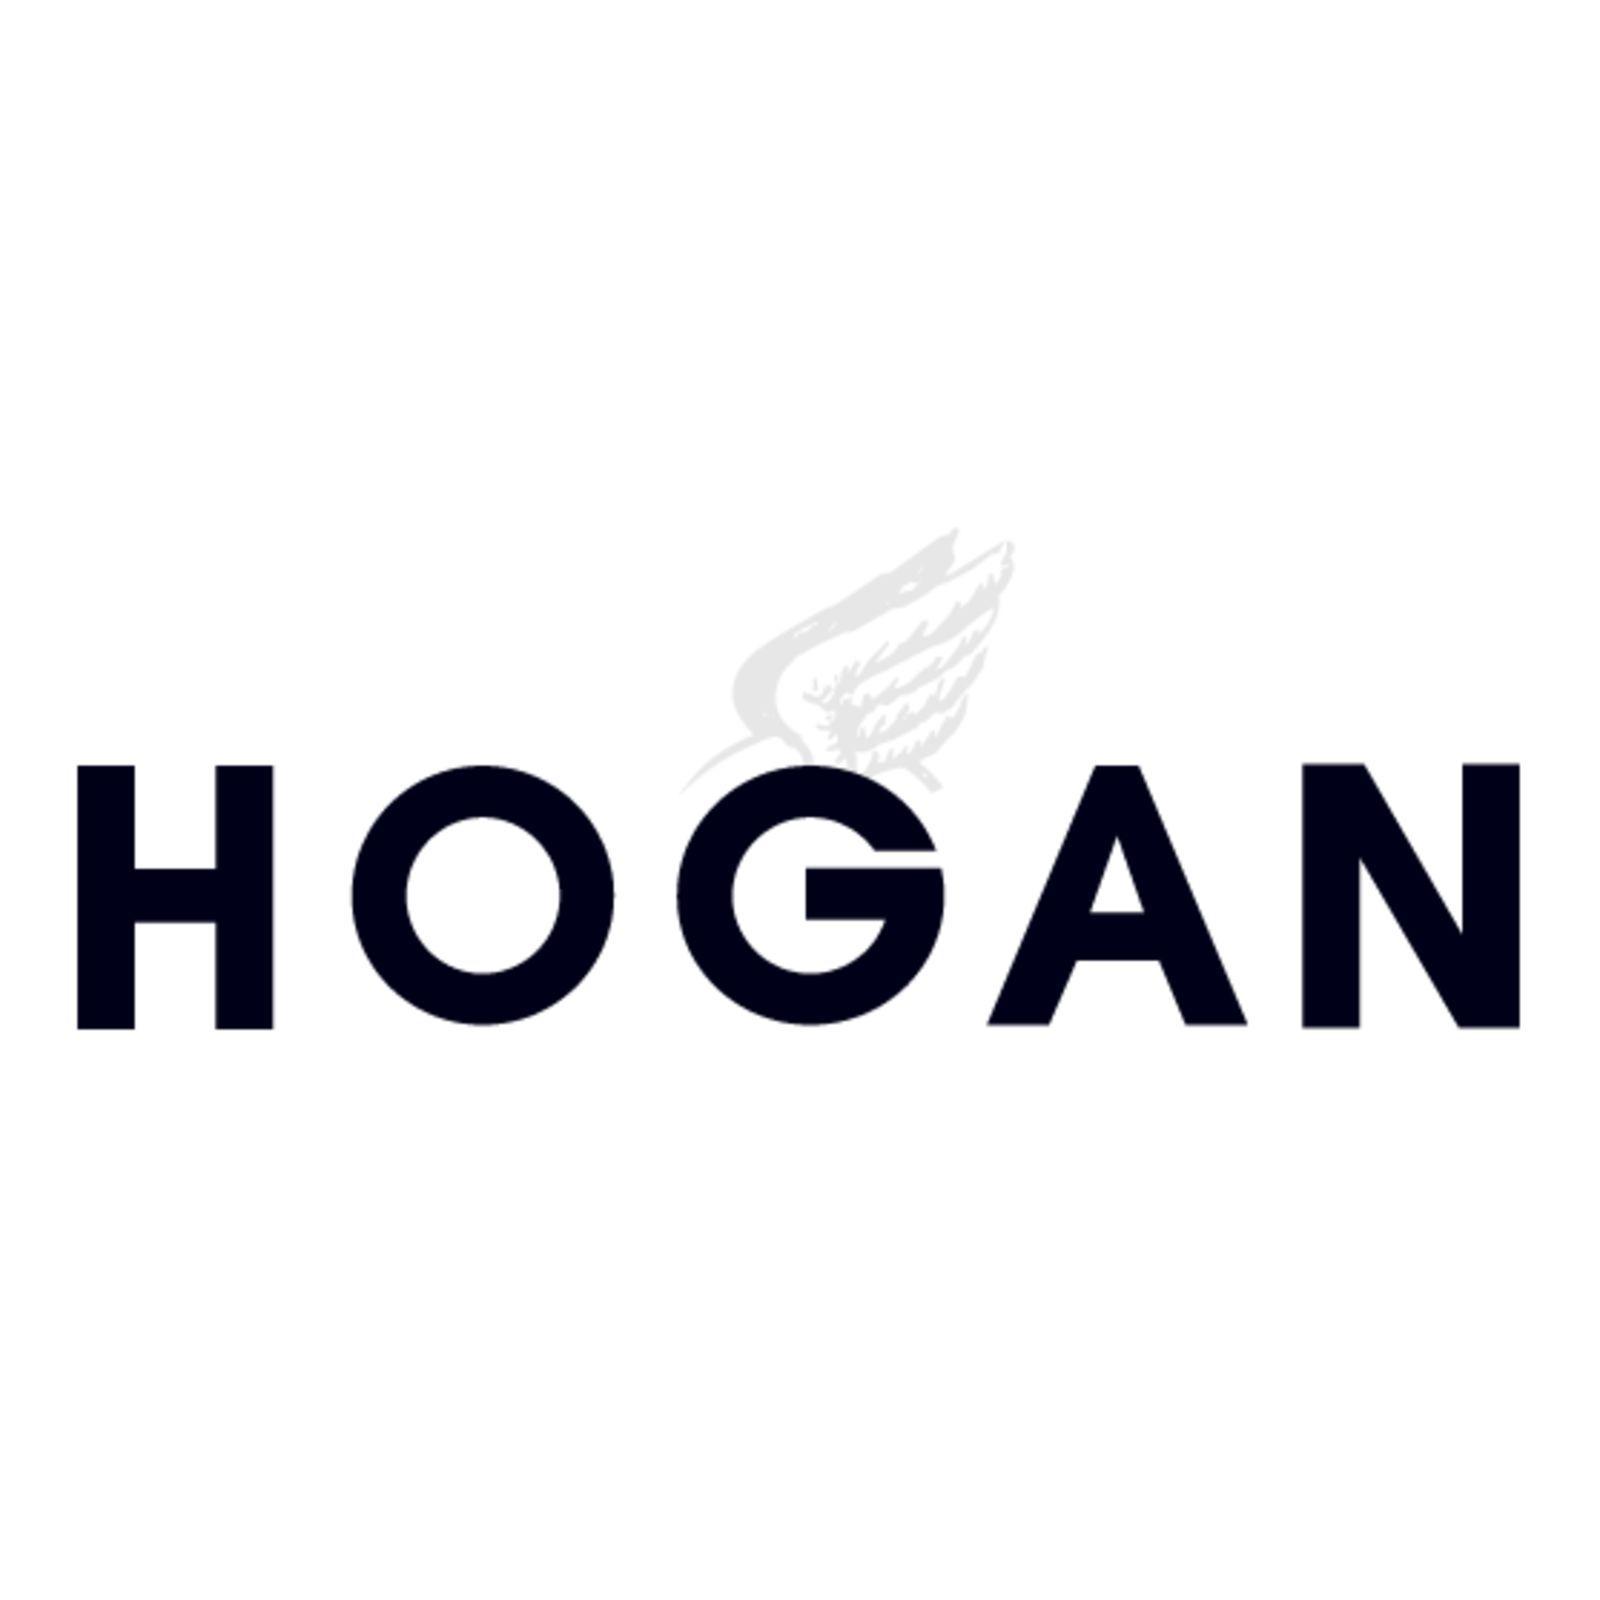 HOGAN (Bild 1)